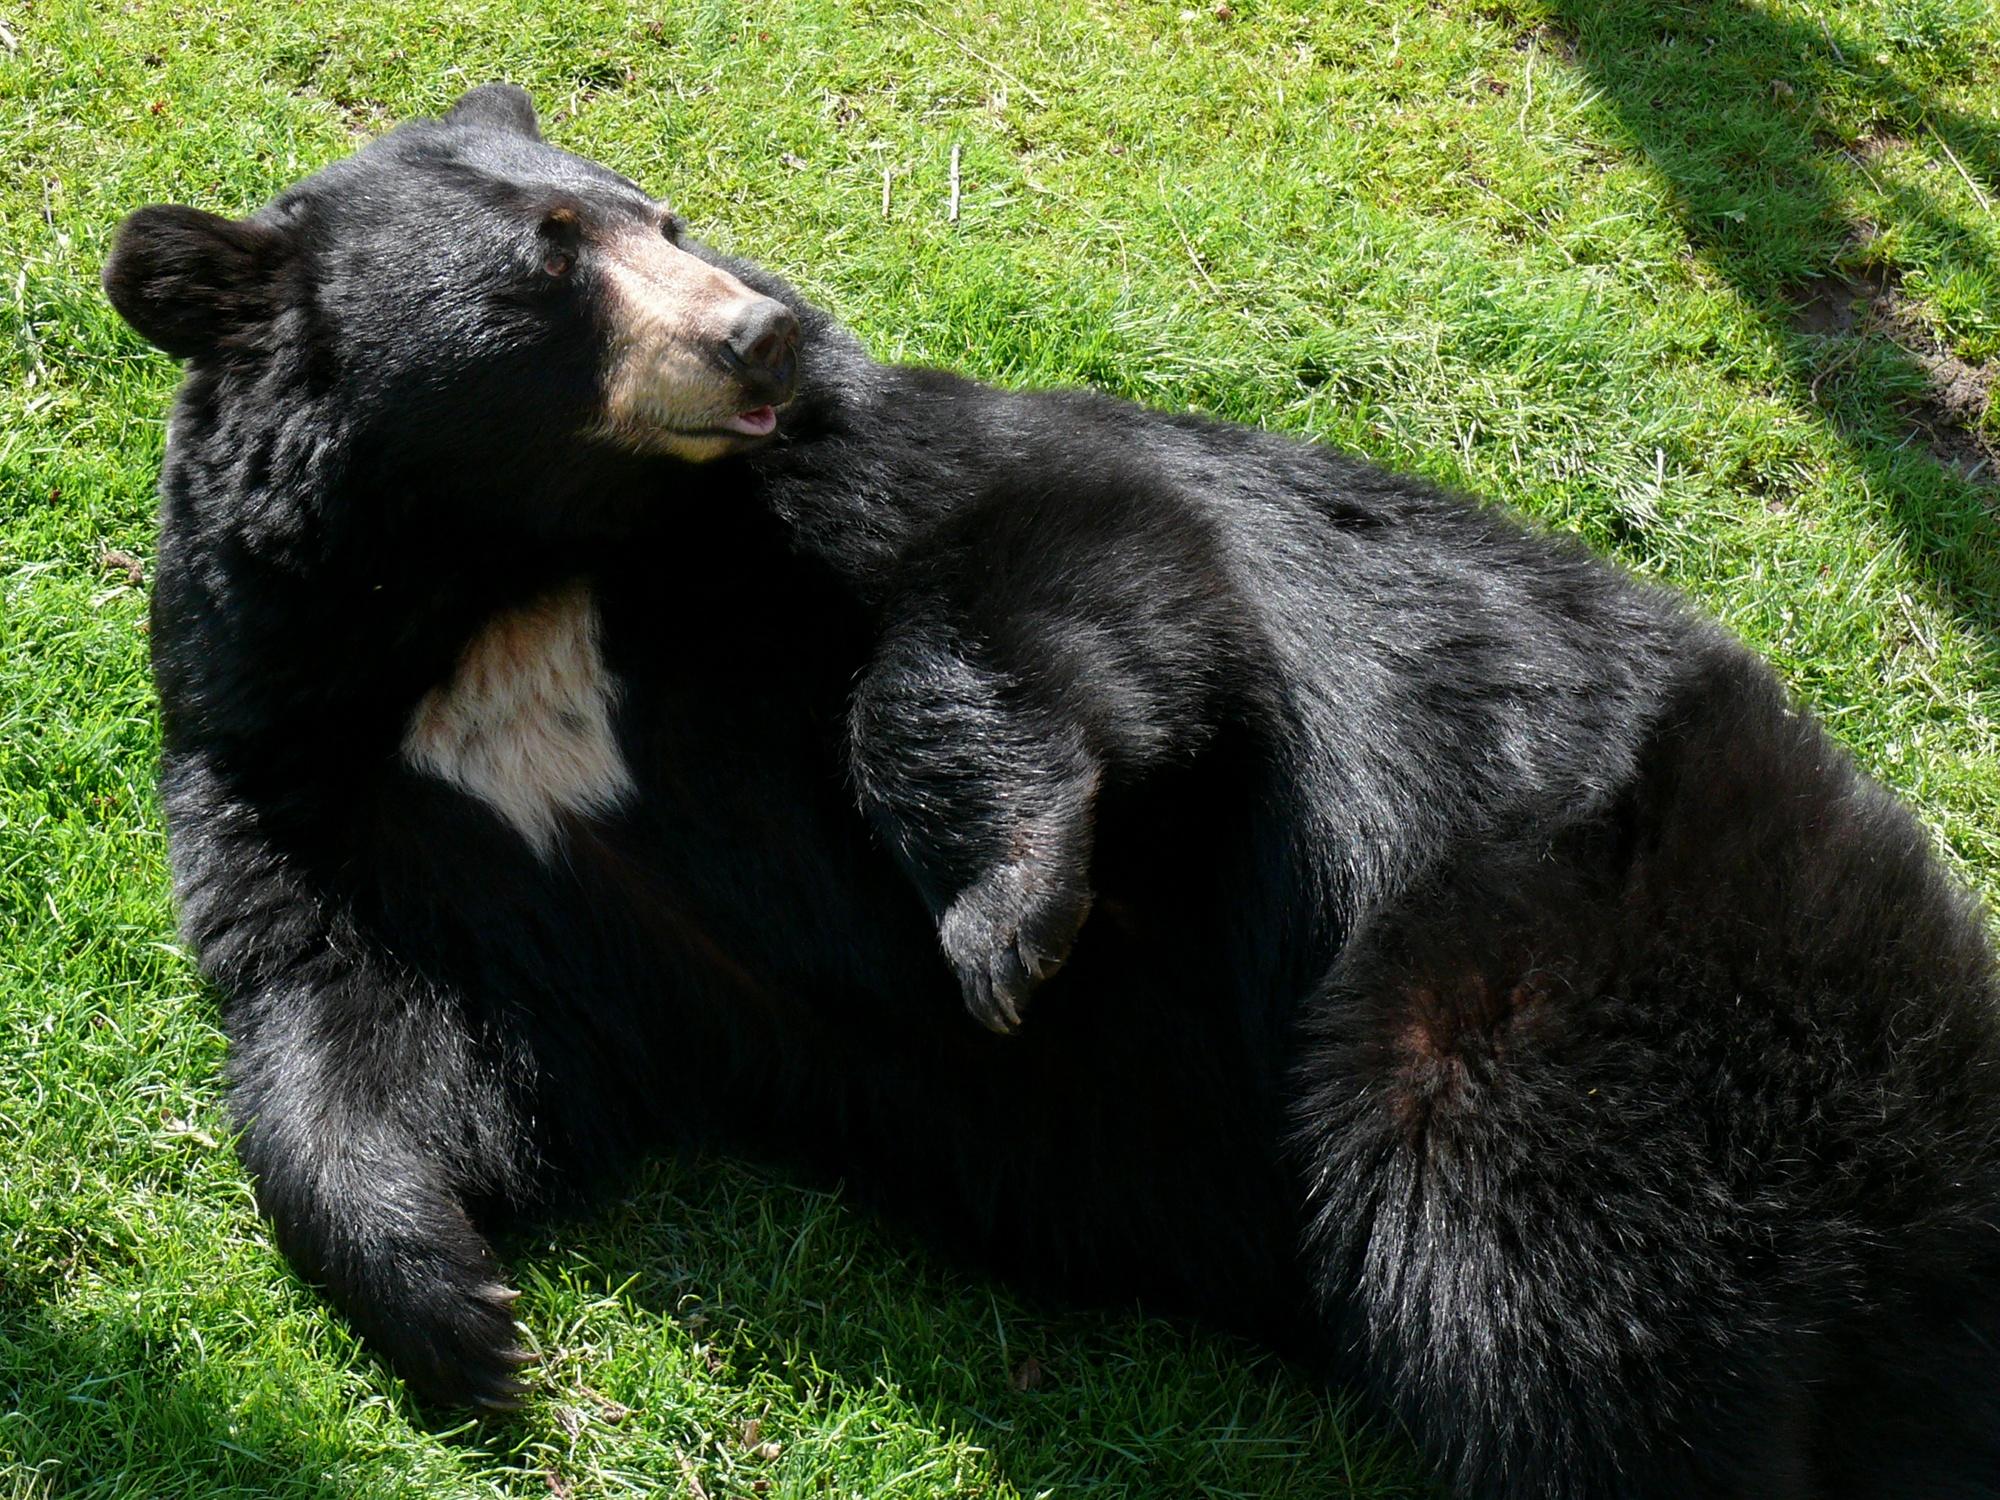 Go bear-watching